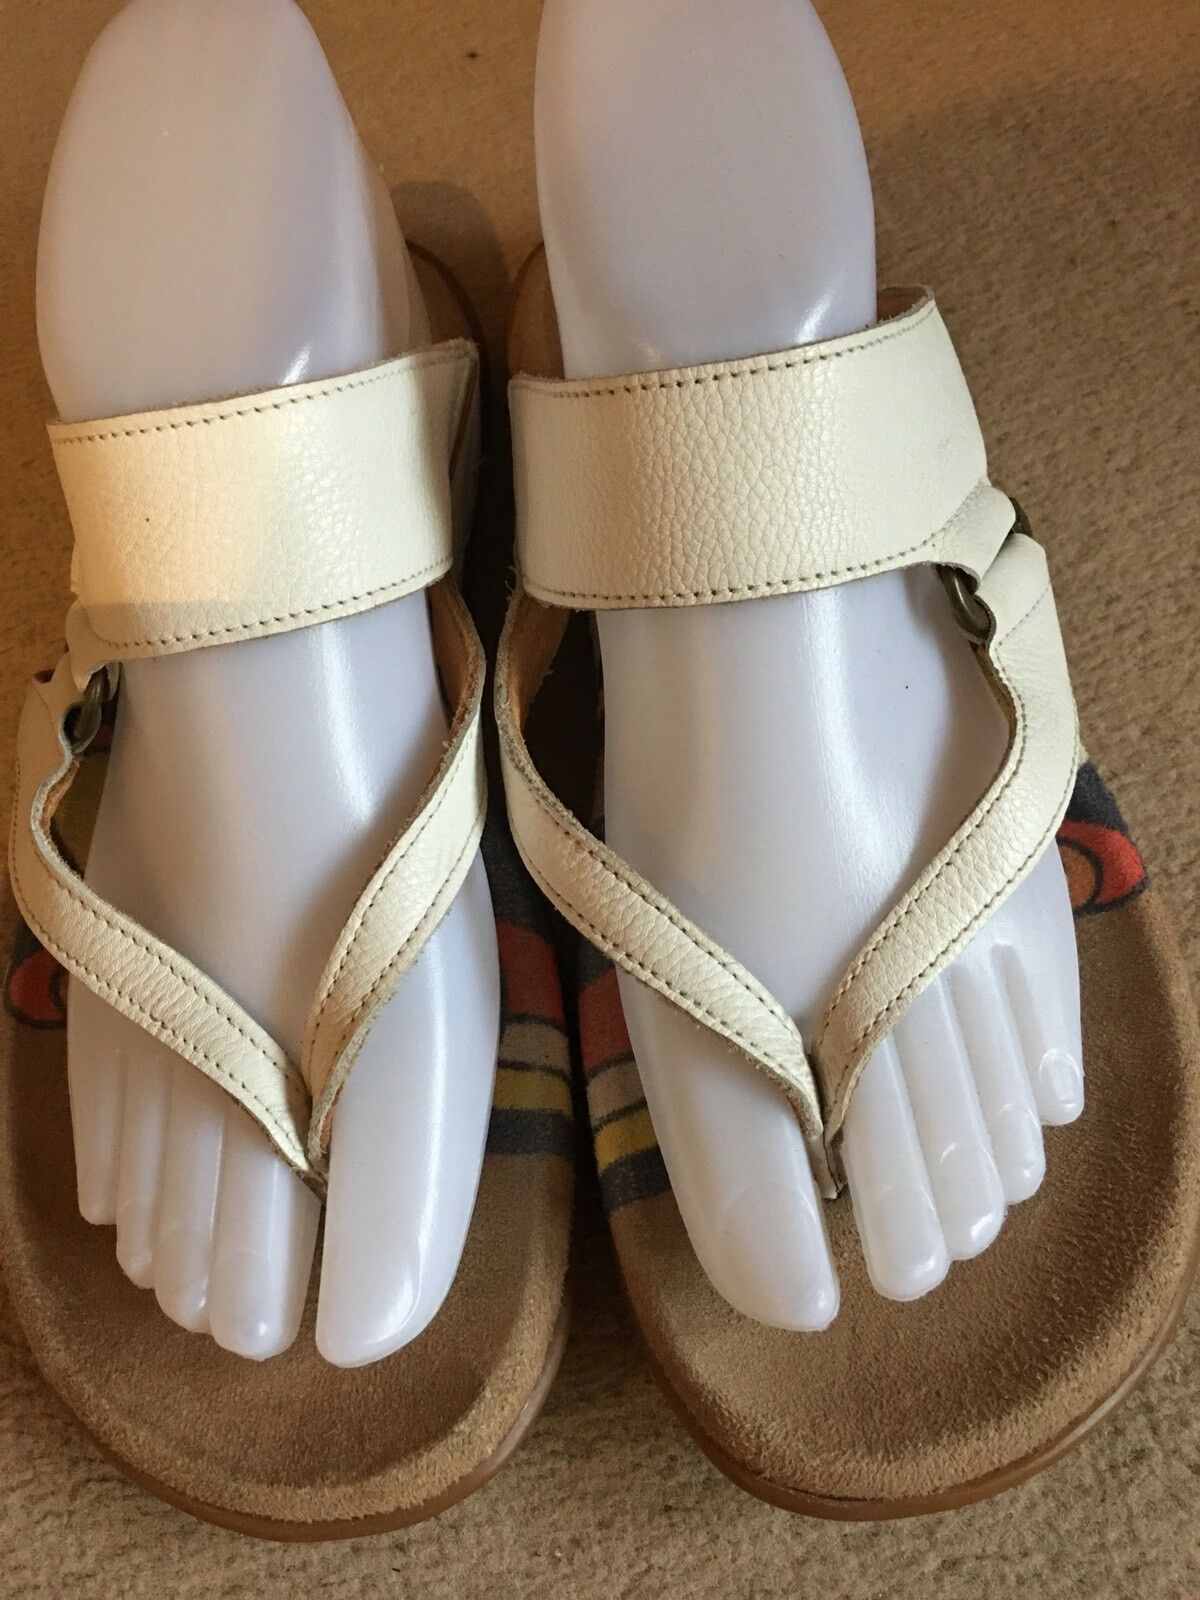 Gabor Jollys con cinturini bianco in pelle punta tonda Sandali... Tg /2... 37.5 UE.